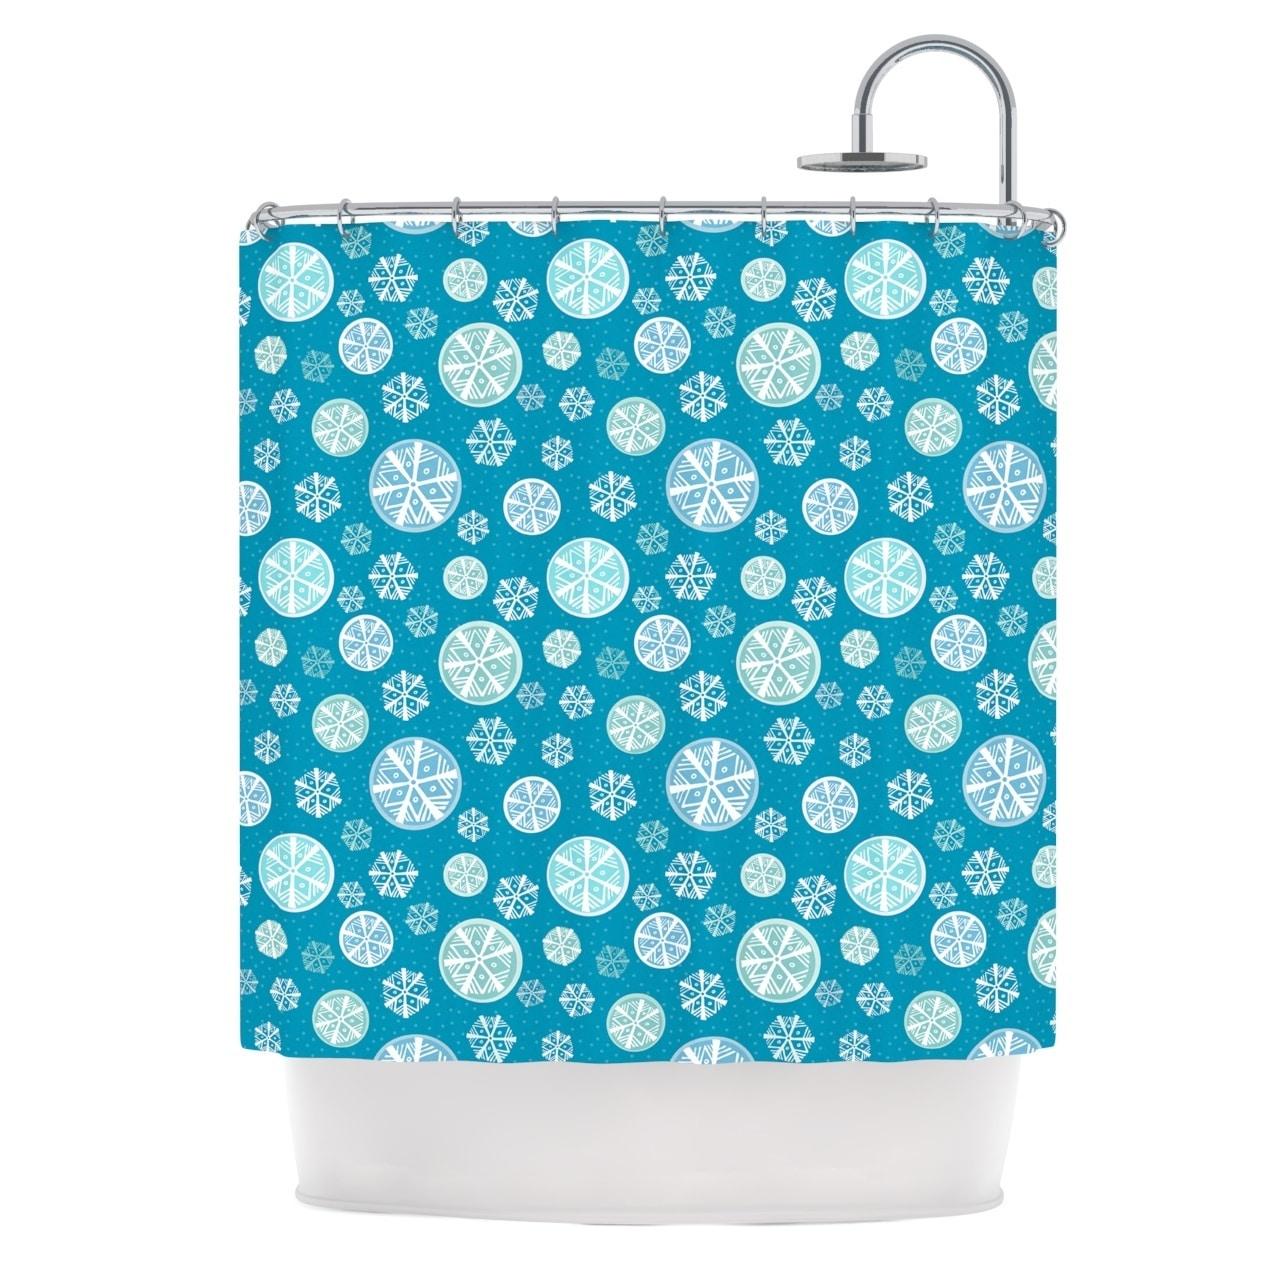 Shop KESS InHouse Julie Hamilton Snowflake Sky Blue Shower Curtain 69x70